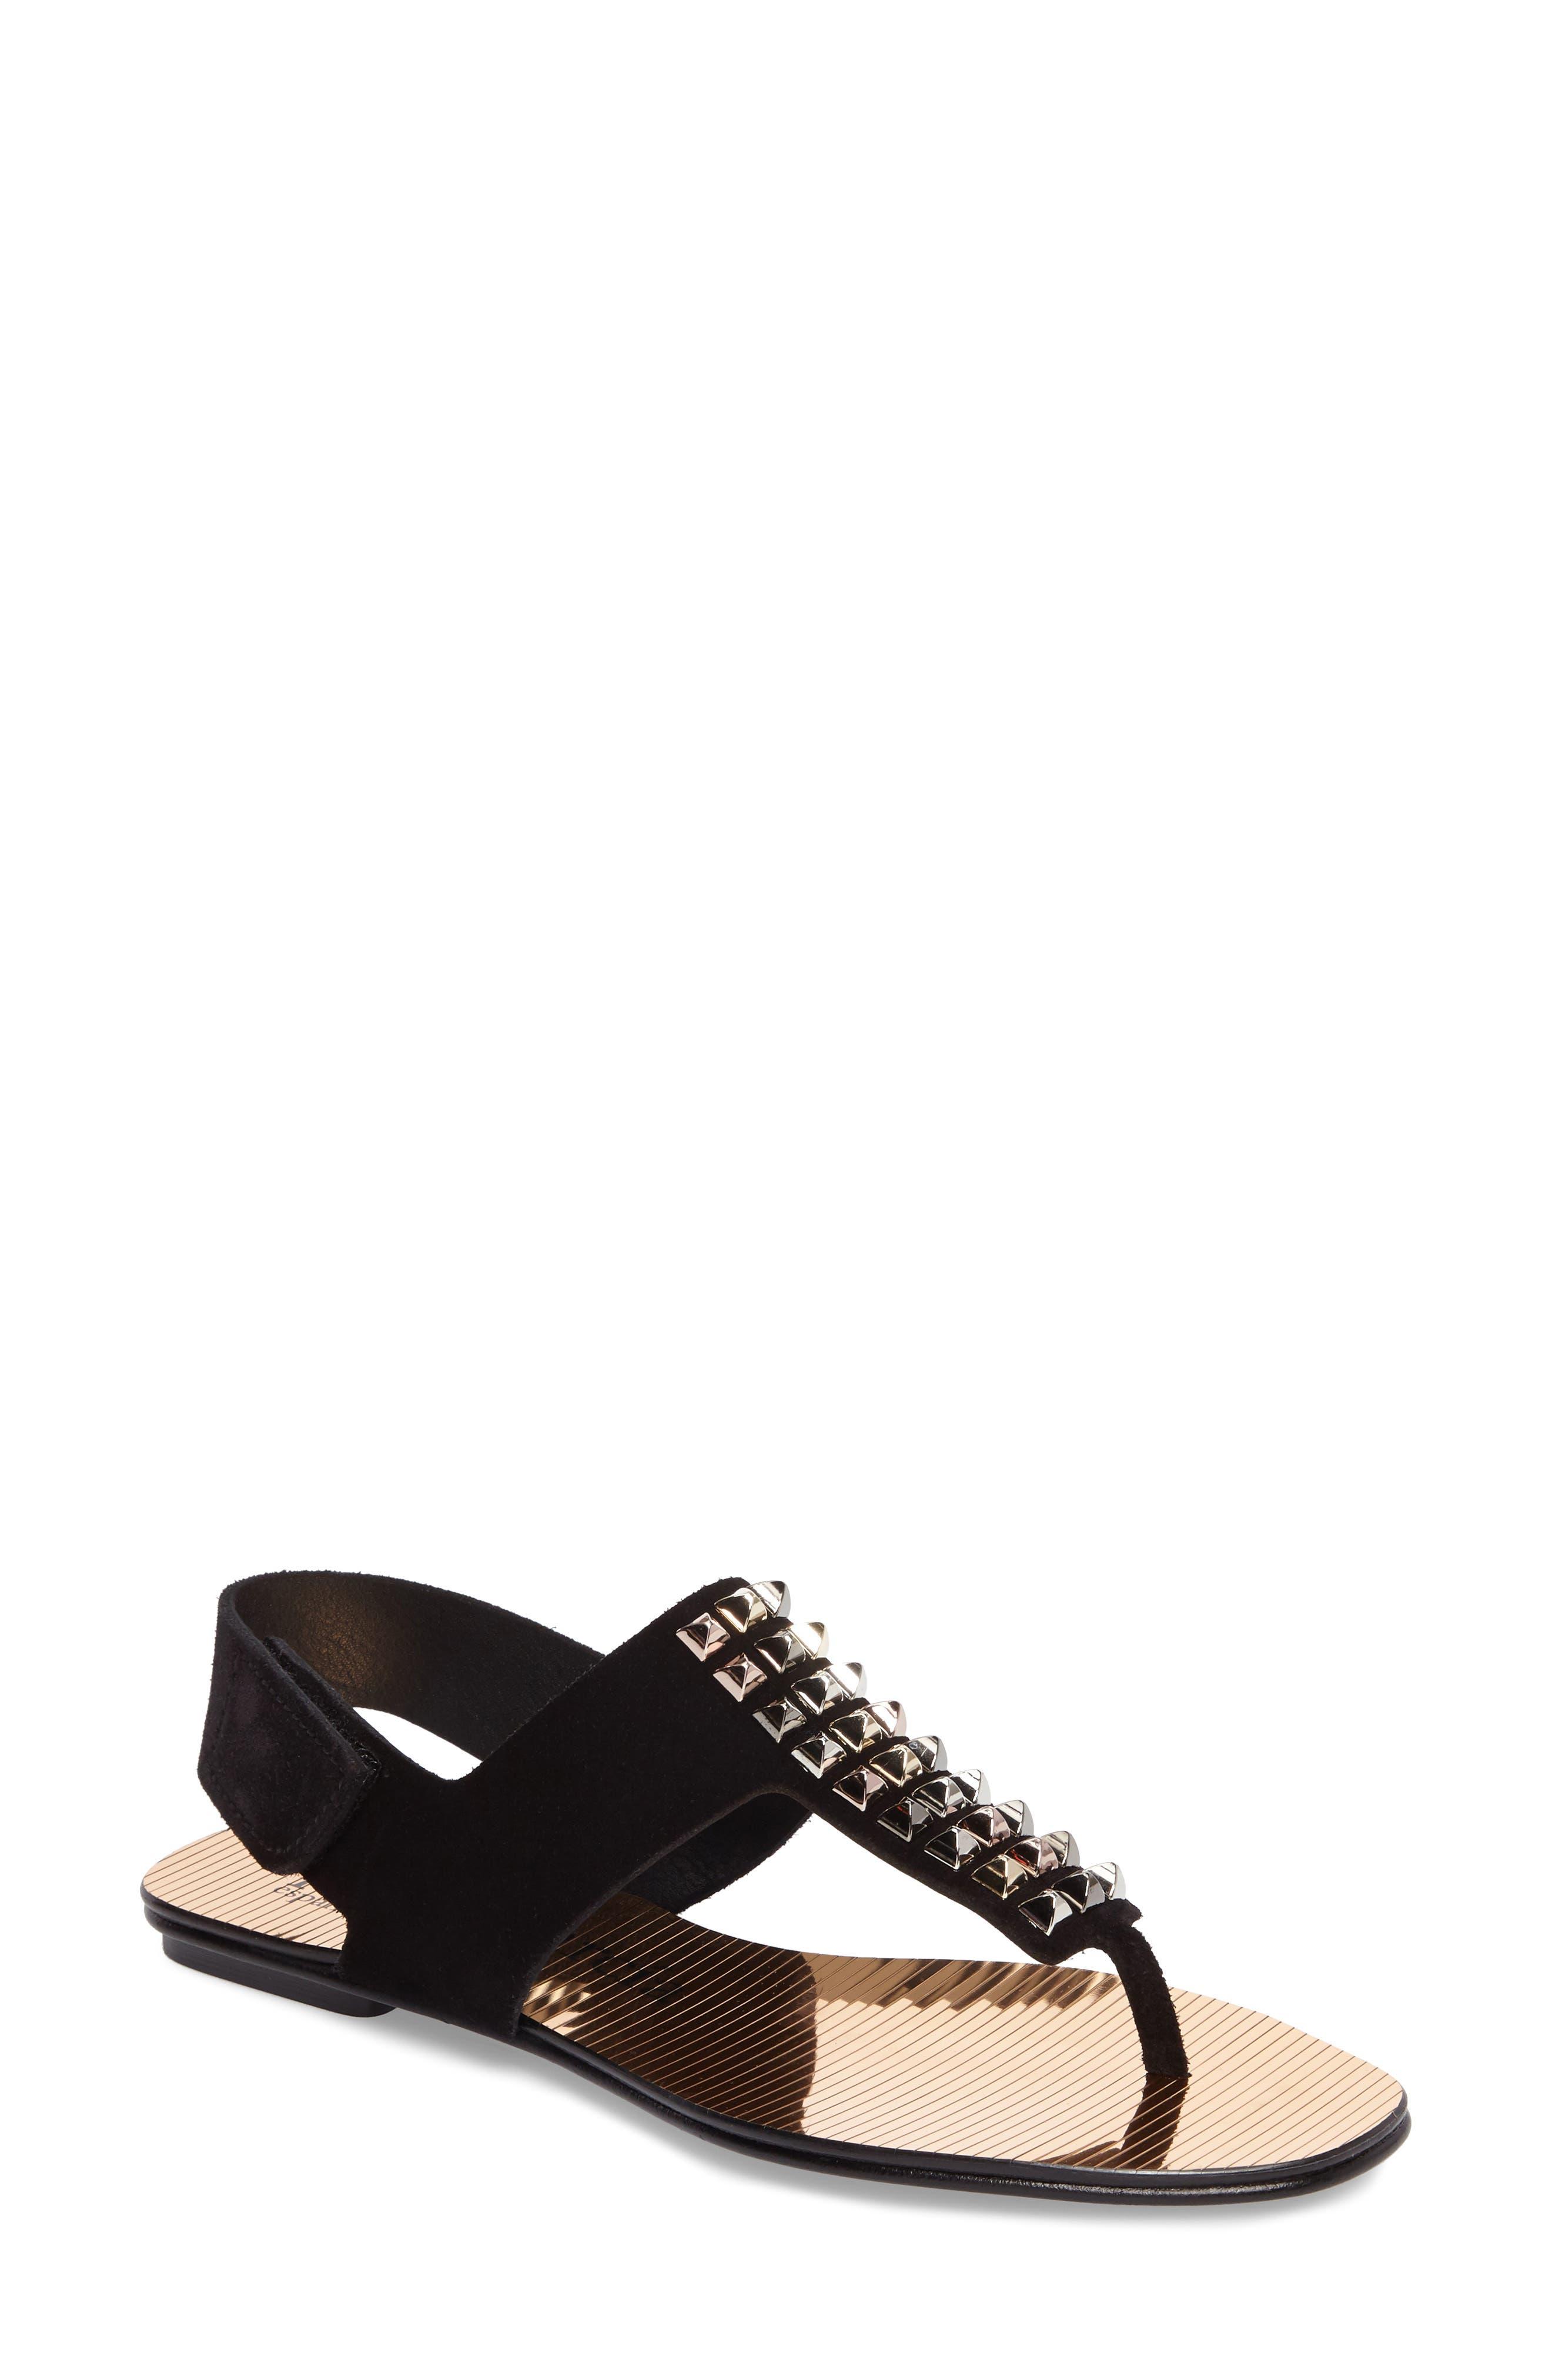 Enid Studded T-Strap Sandal,                             Main thumbnail 1, color,                             001